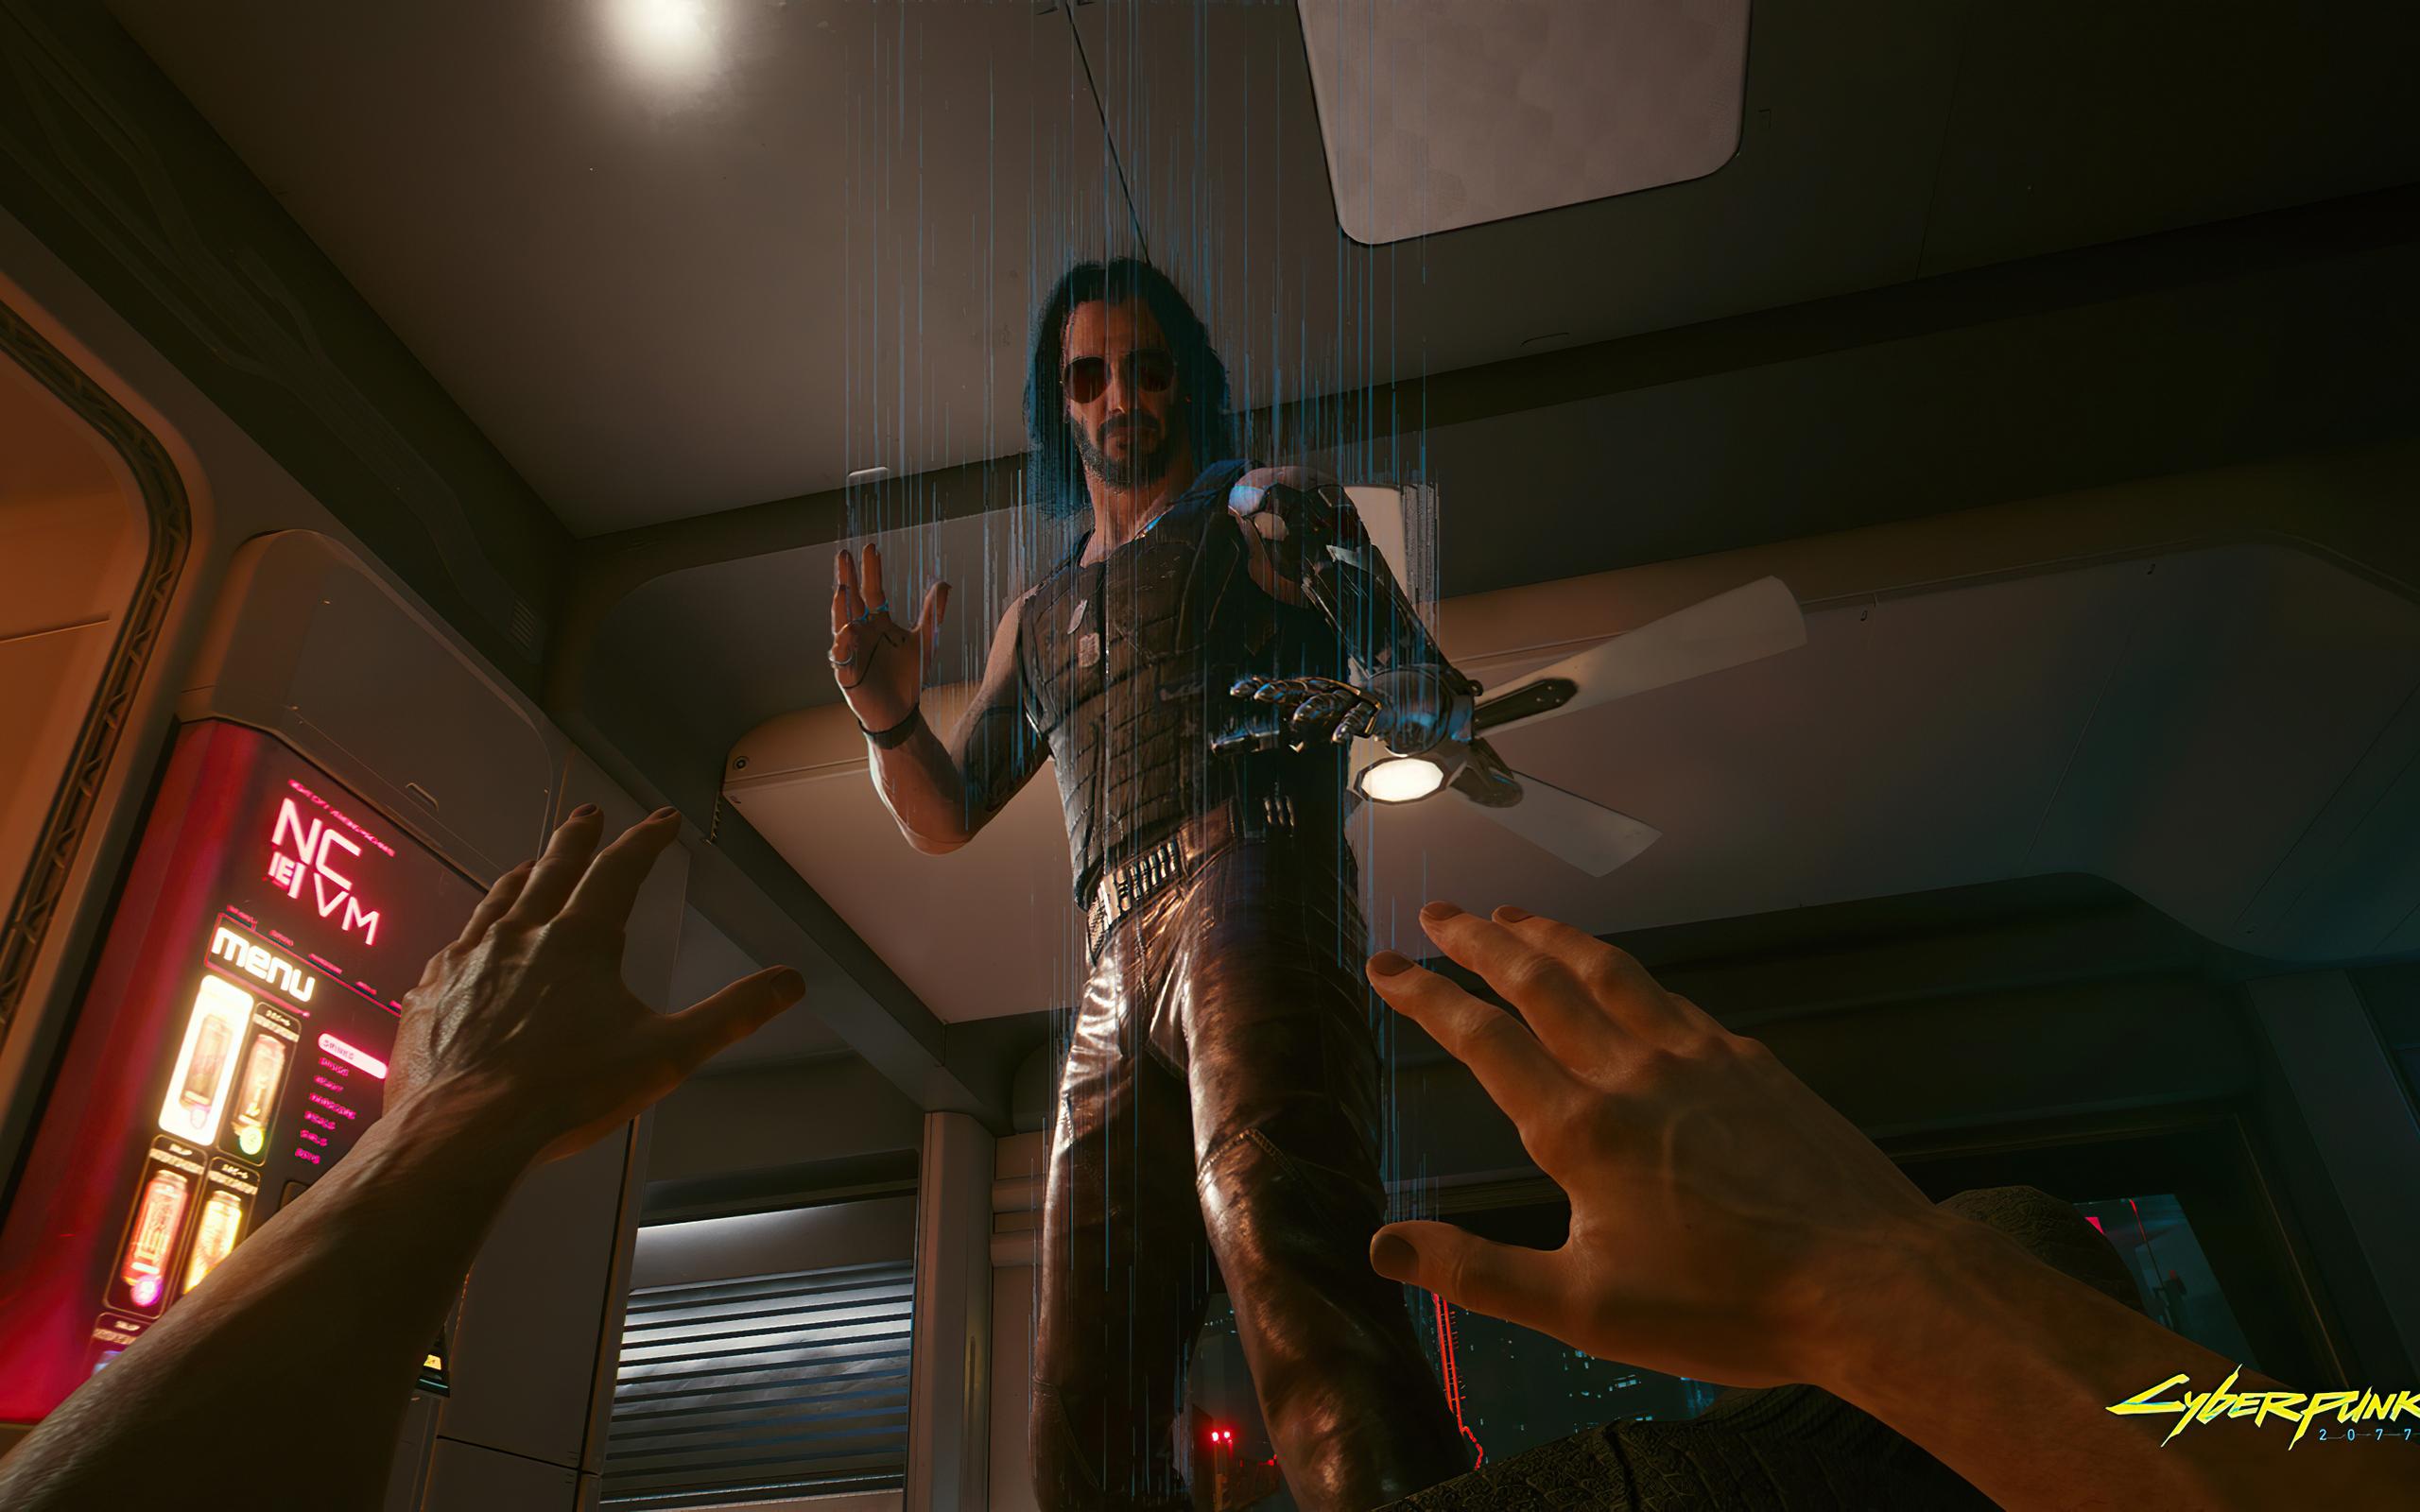 cyberpunk-2077-johnny-silverhand-4k-new-game-jq.jpg